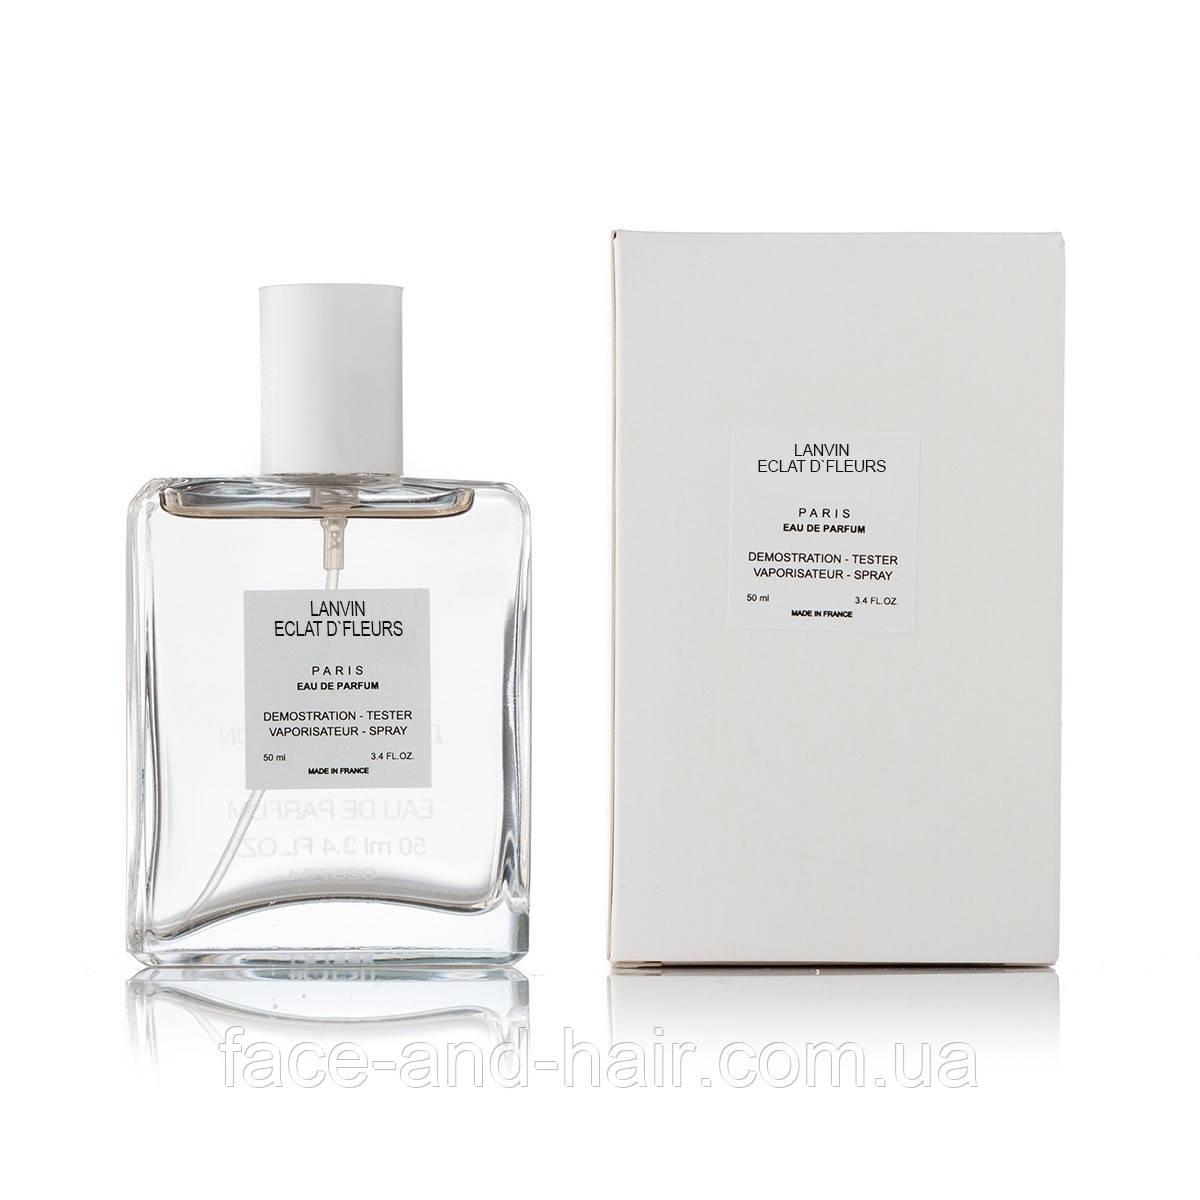 Lanvin Eclat D`Fleurs - White Tester 50ml